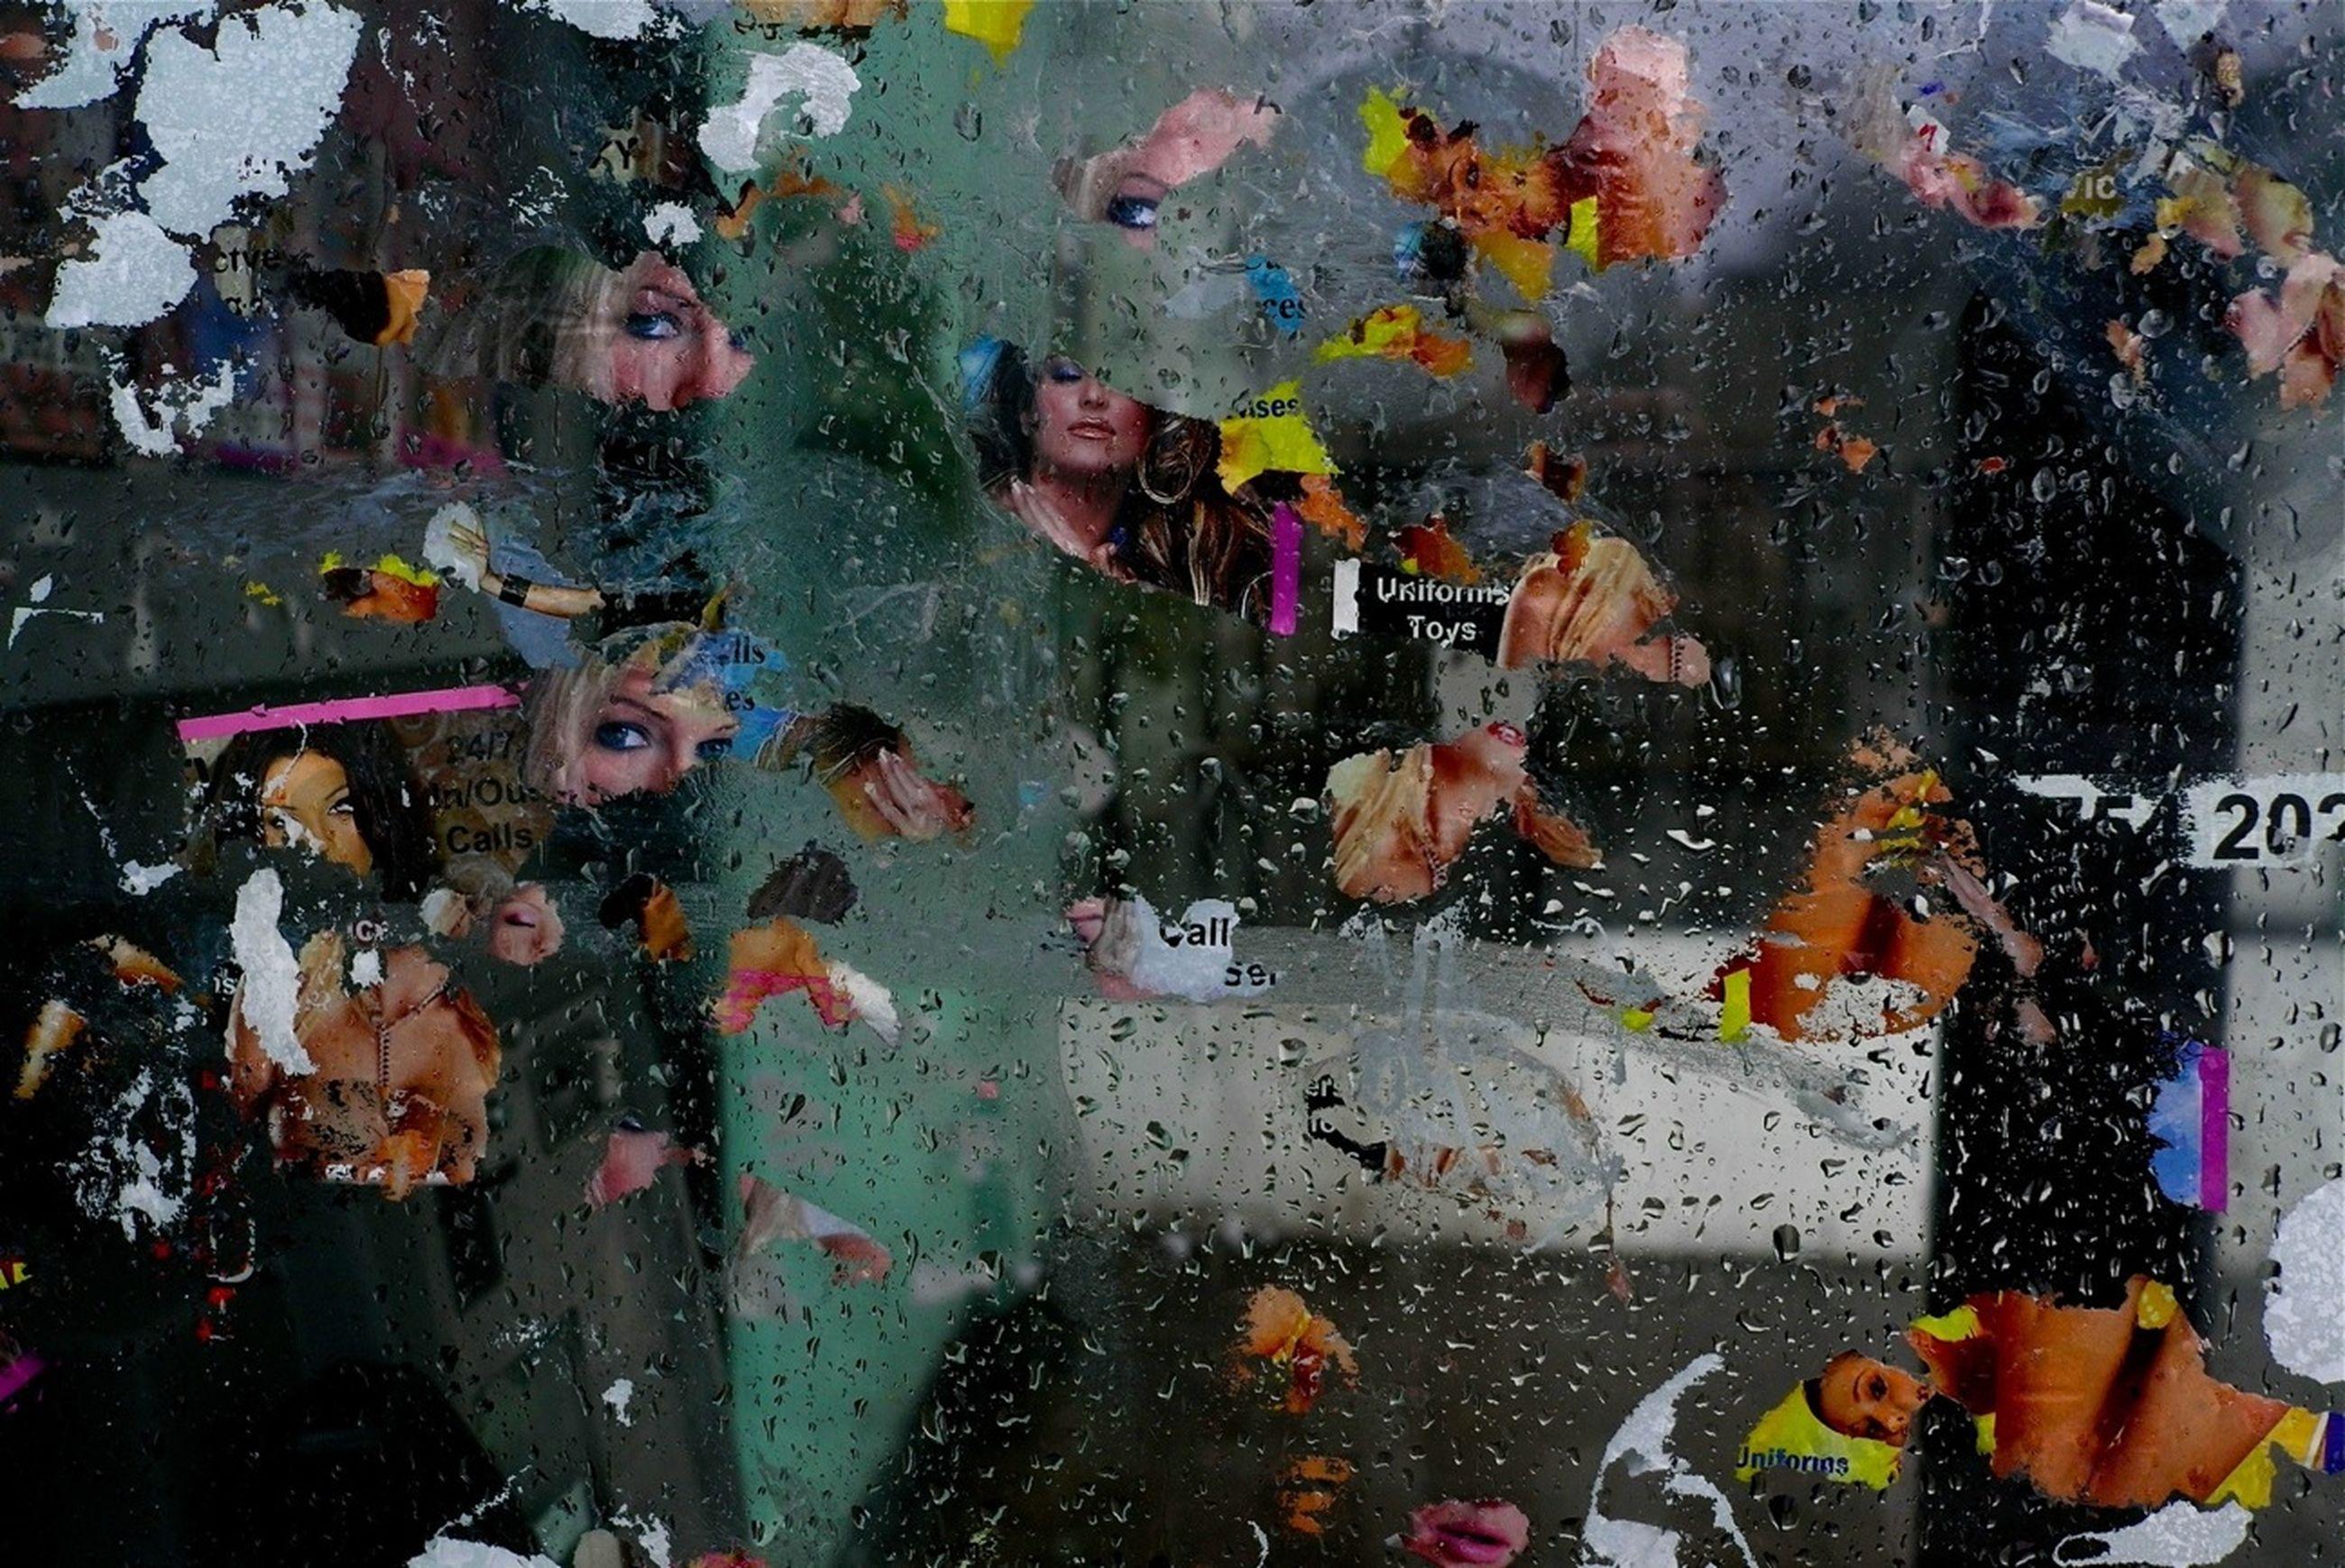 wet, rain, drop, season, indoors, built structure, full frame, weather, land vehicle, transportation, car, backgrounds, architecture, mode of transport, window, street, building exterior, raindrop, monsoon, close-up